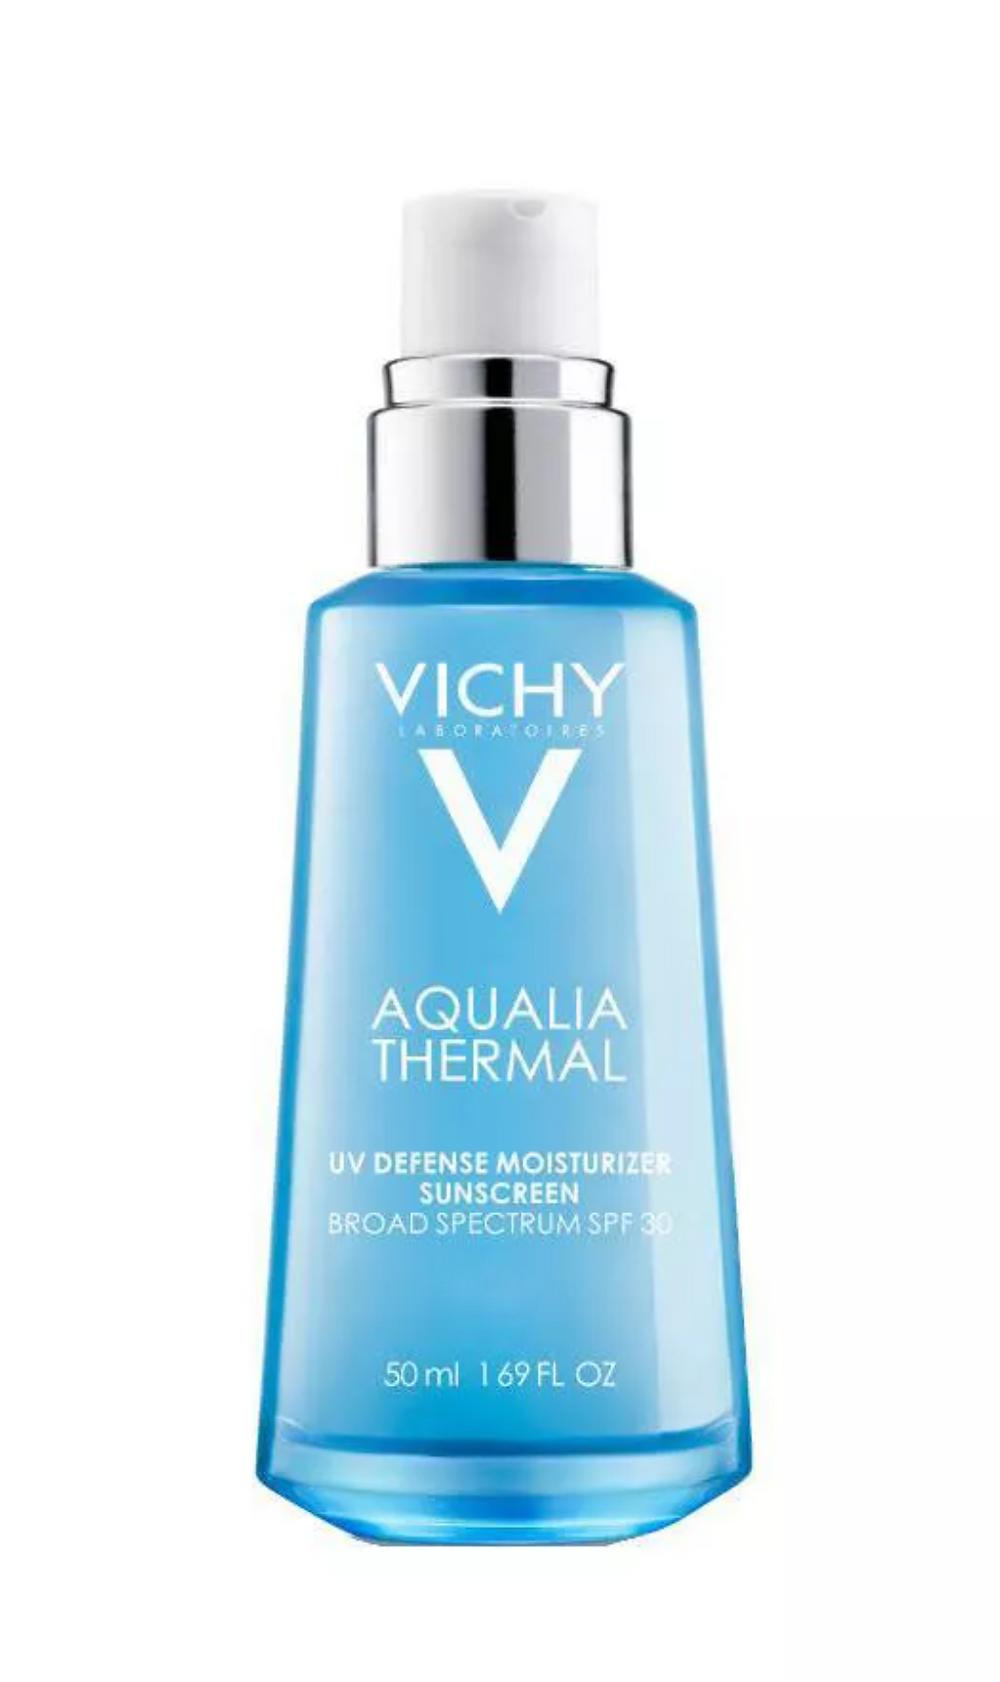 Vichy Aqualia Thermal Defense Moisturizer